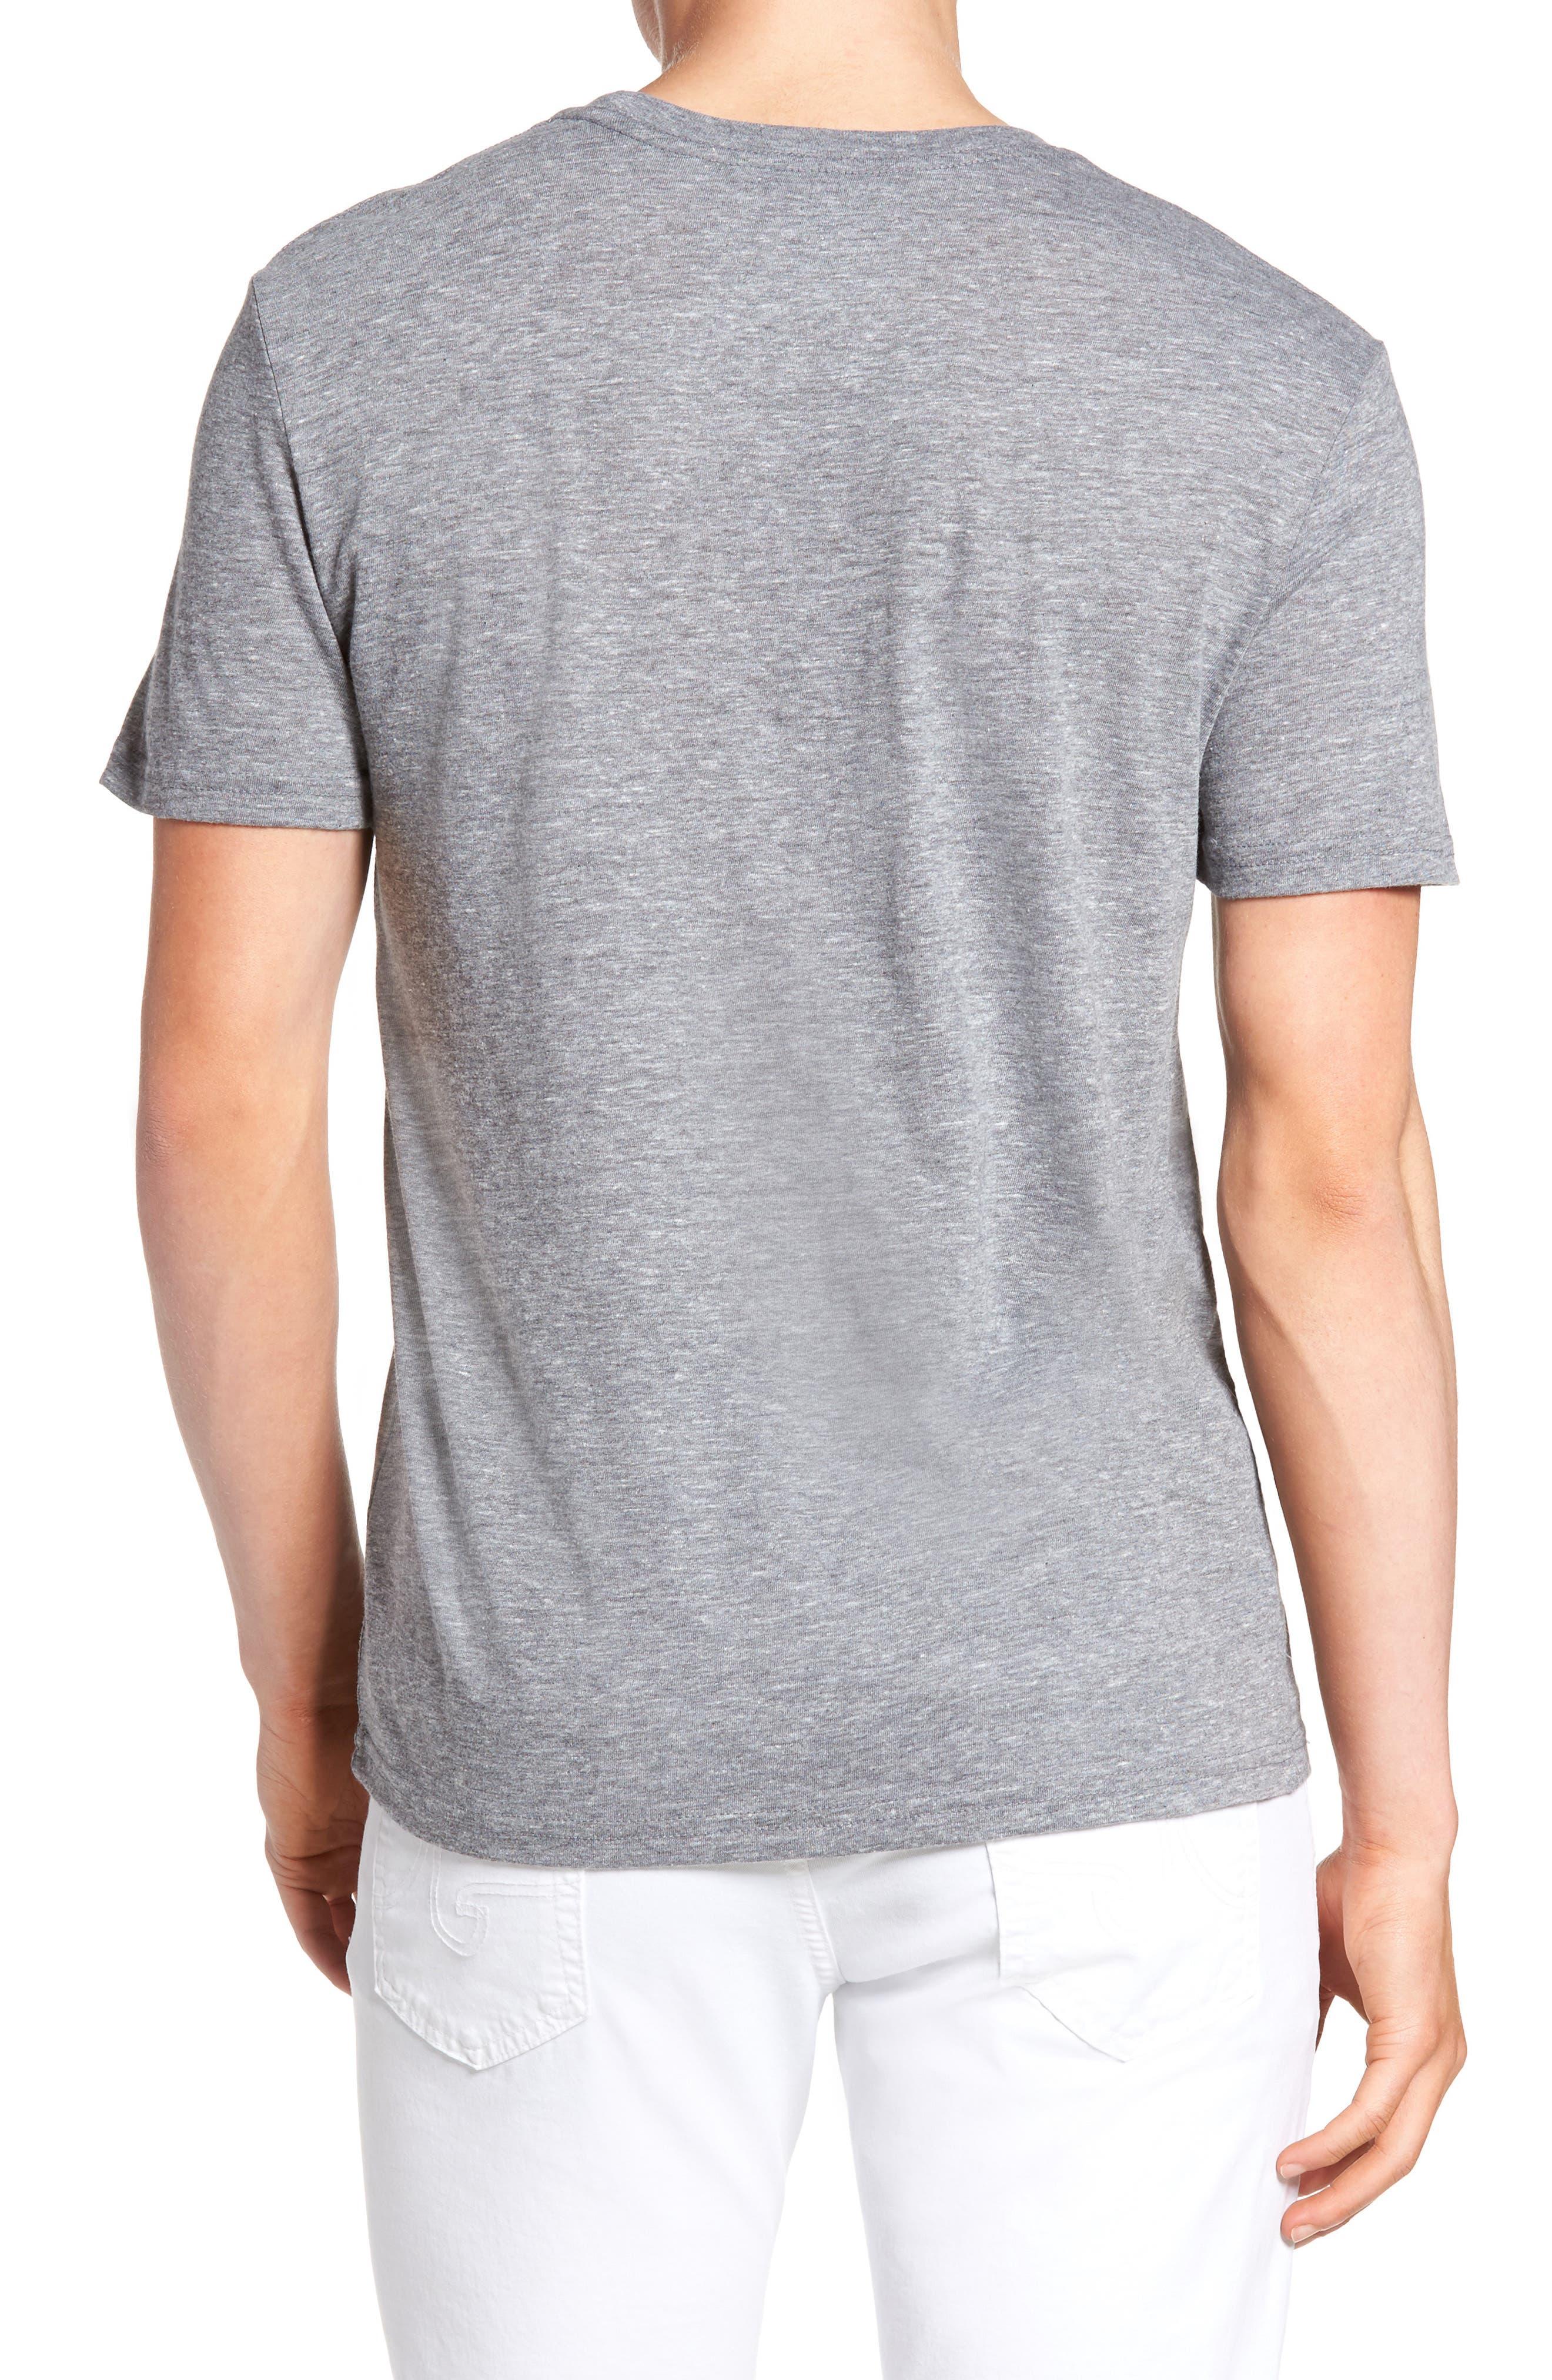 Alternate Image 2  - The Rail Slim Fit Crewneck T-Shirt